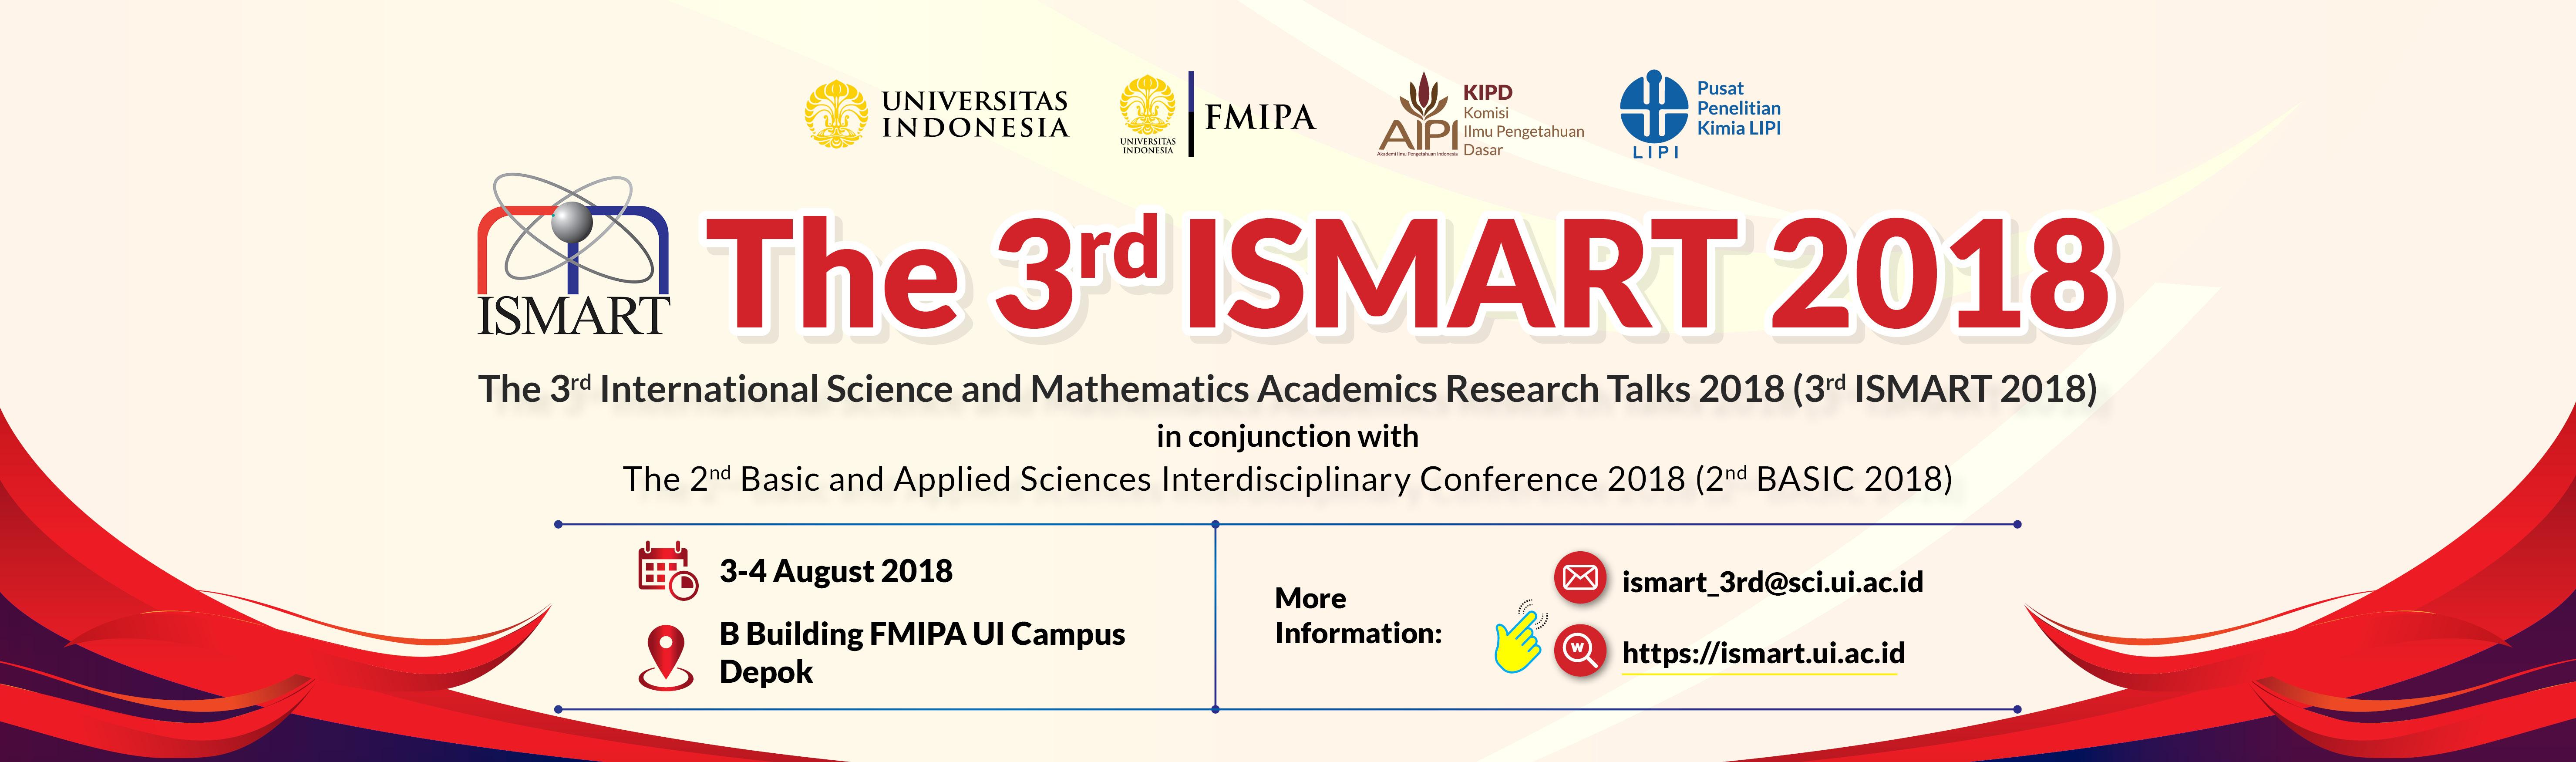 Web-Banner-ISMARTBasic2018_MIPA